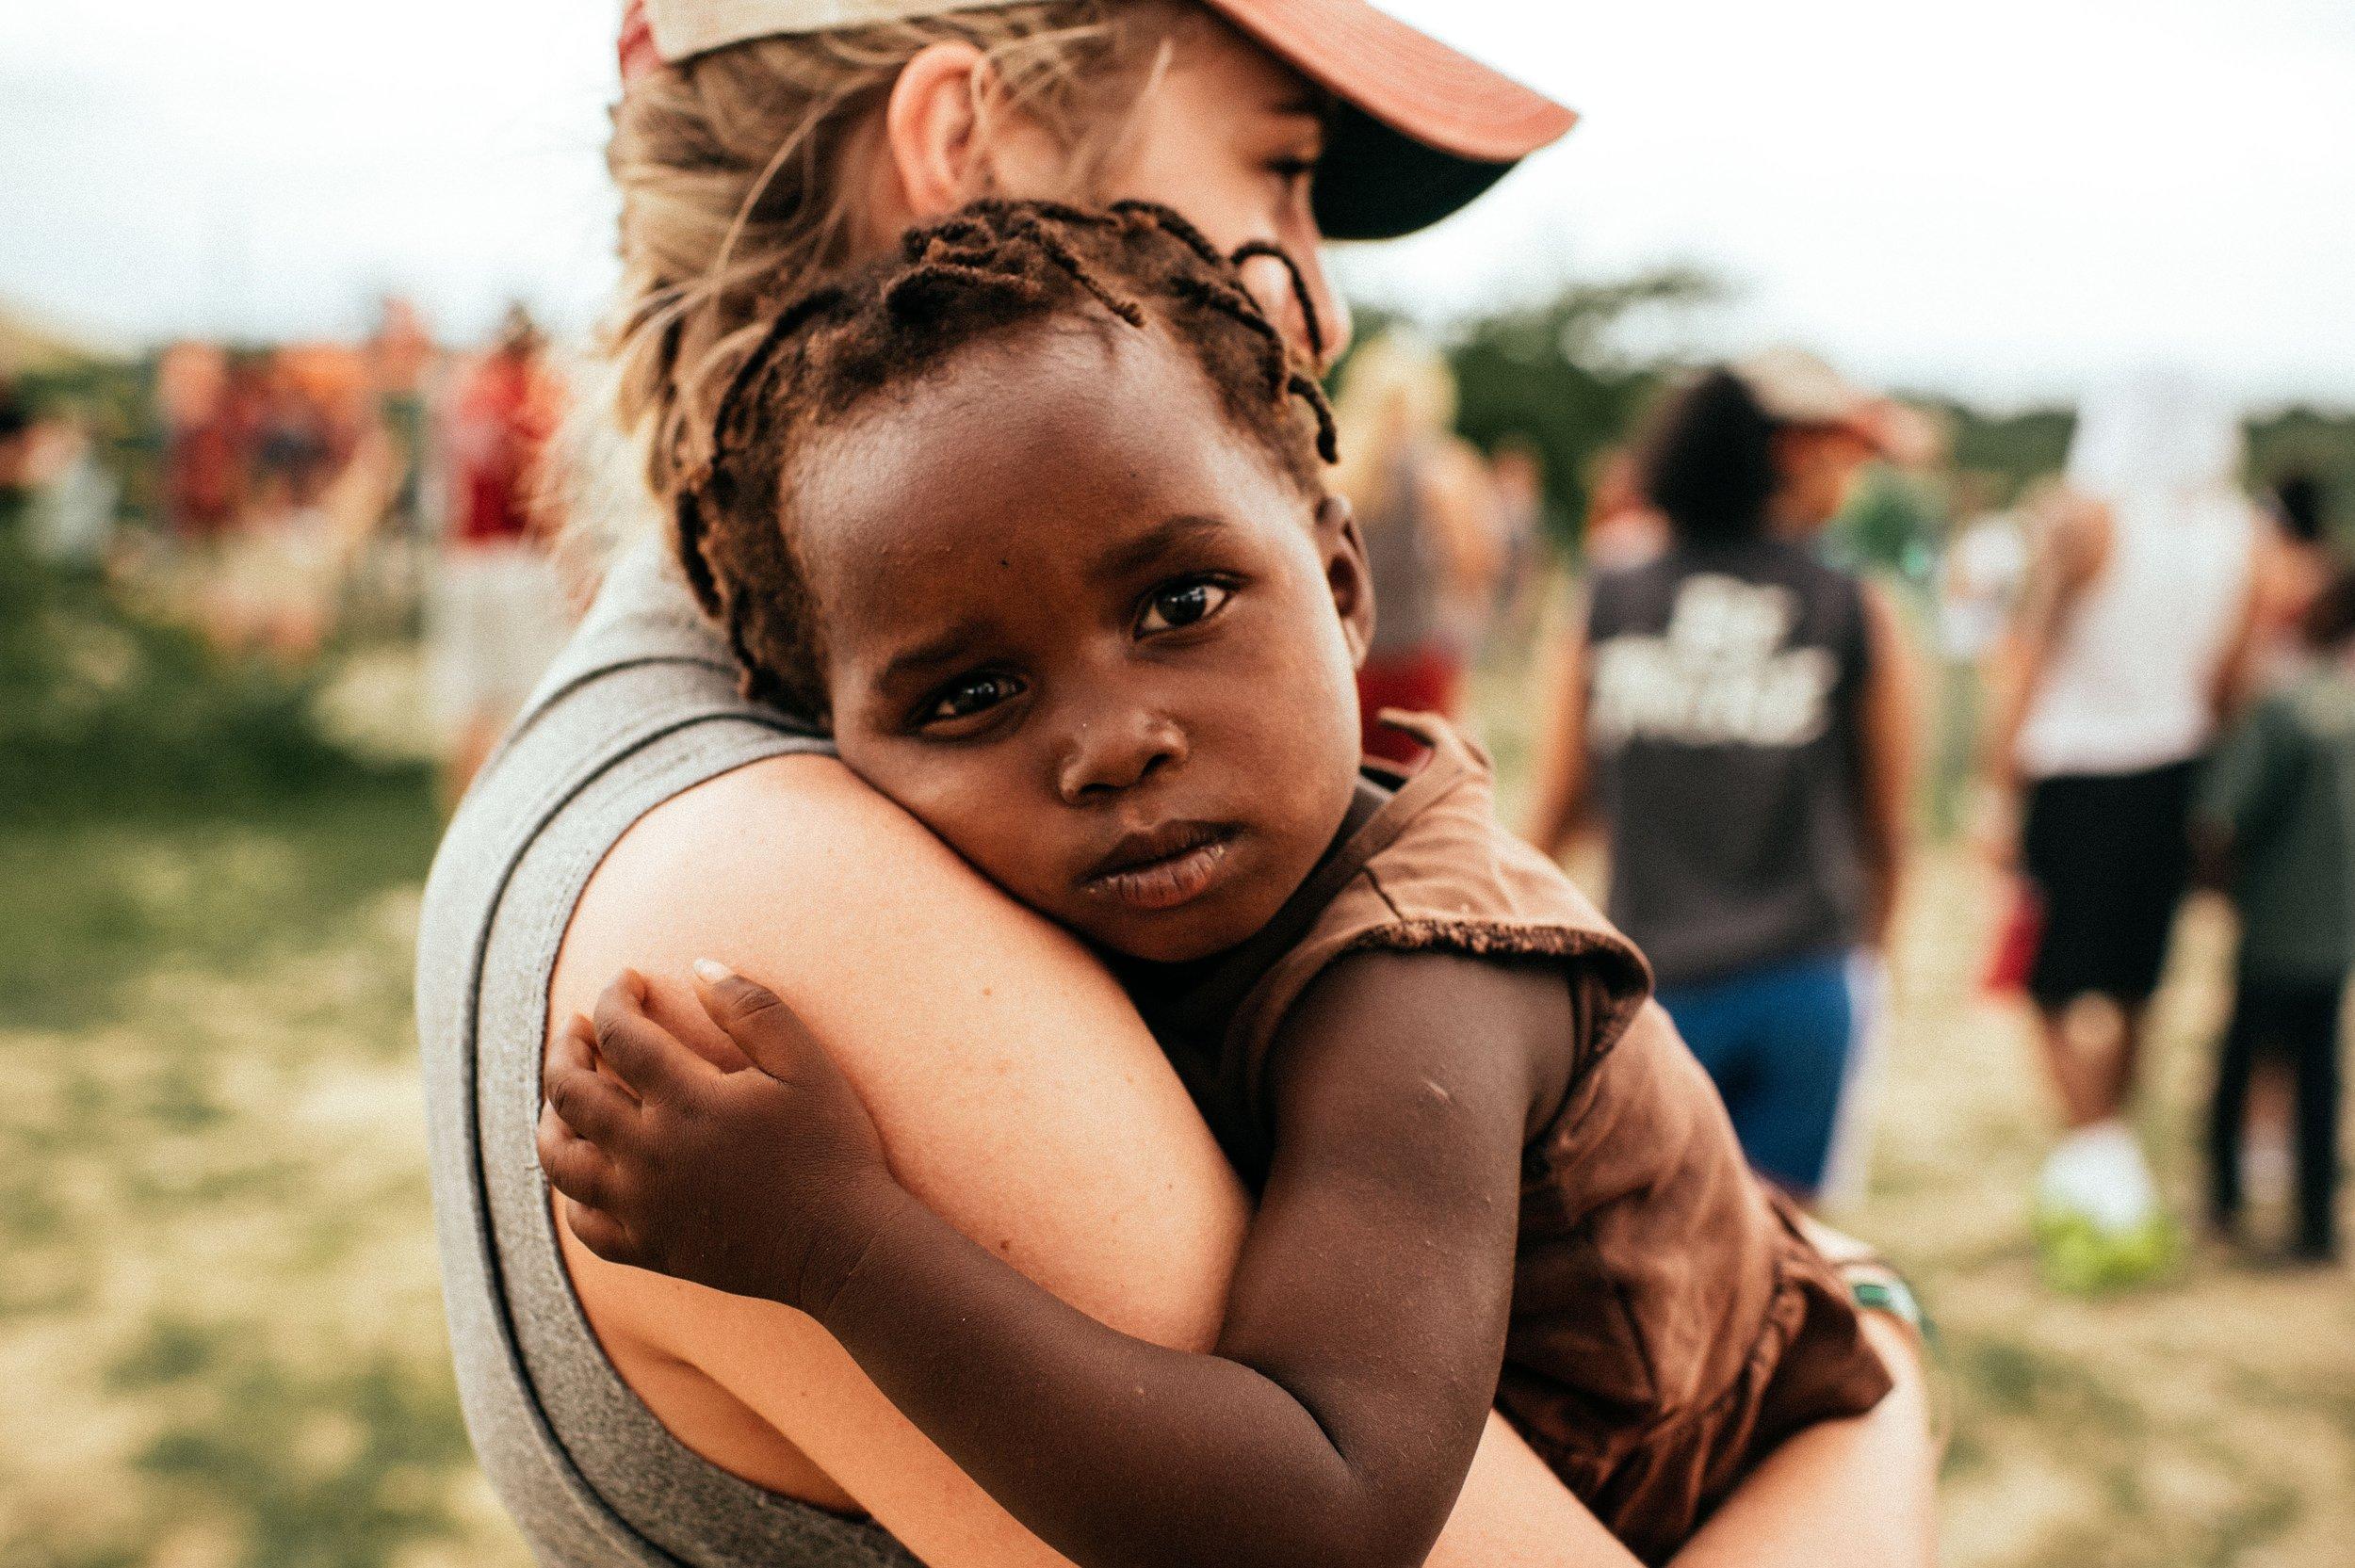 Responsible Travel - Experiencing life in communities